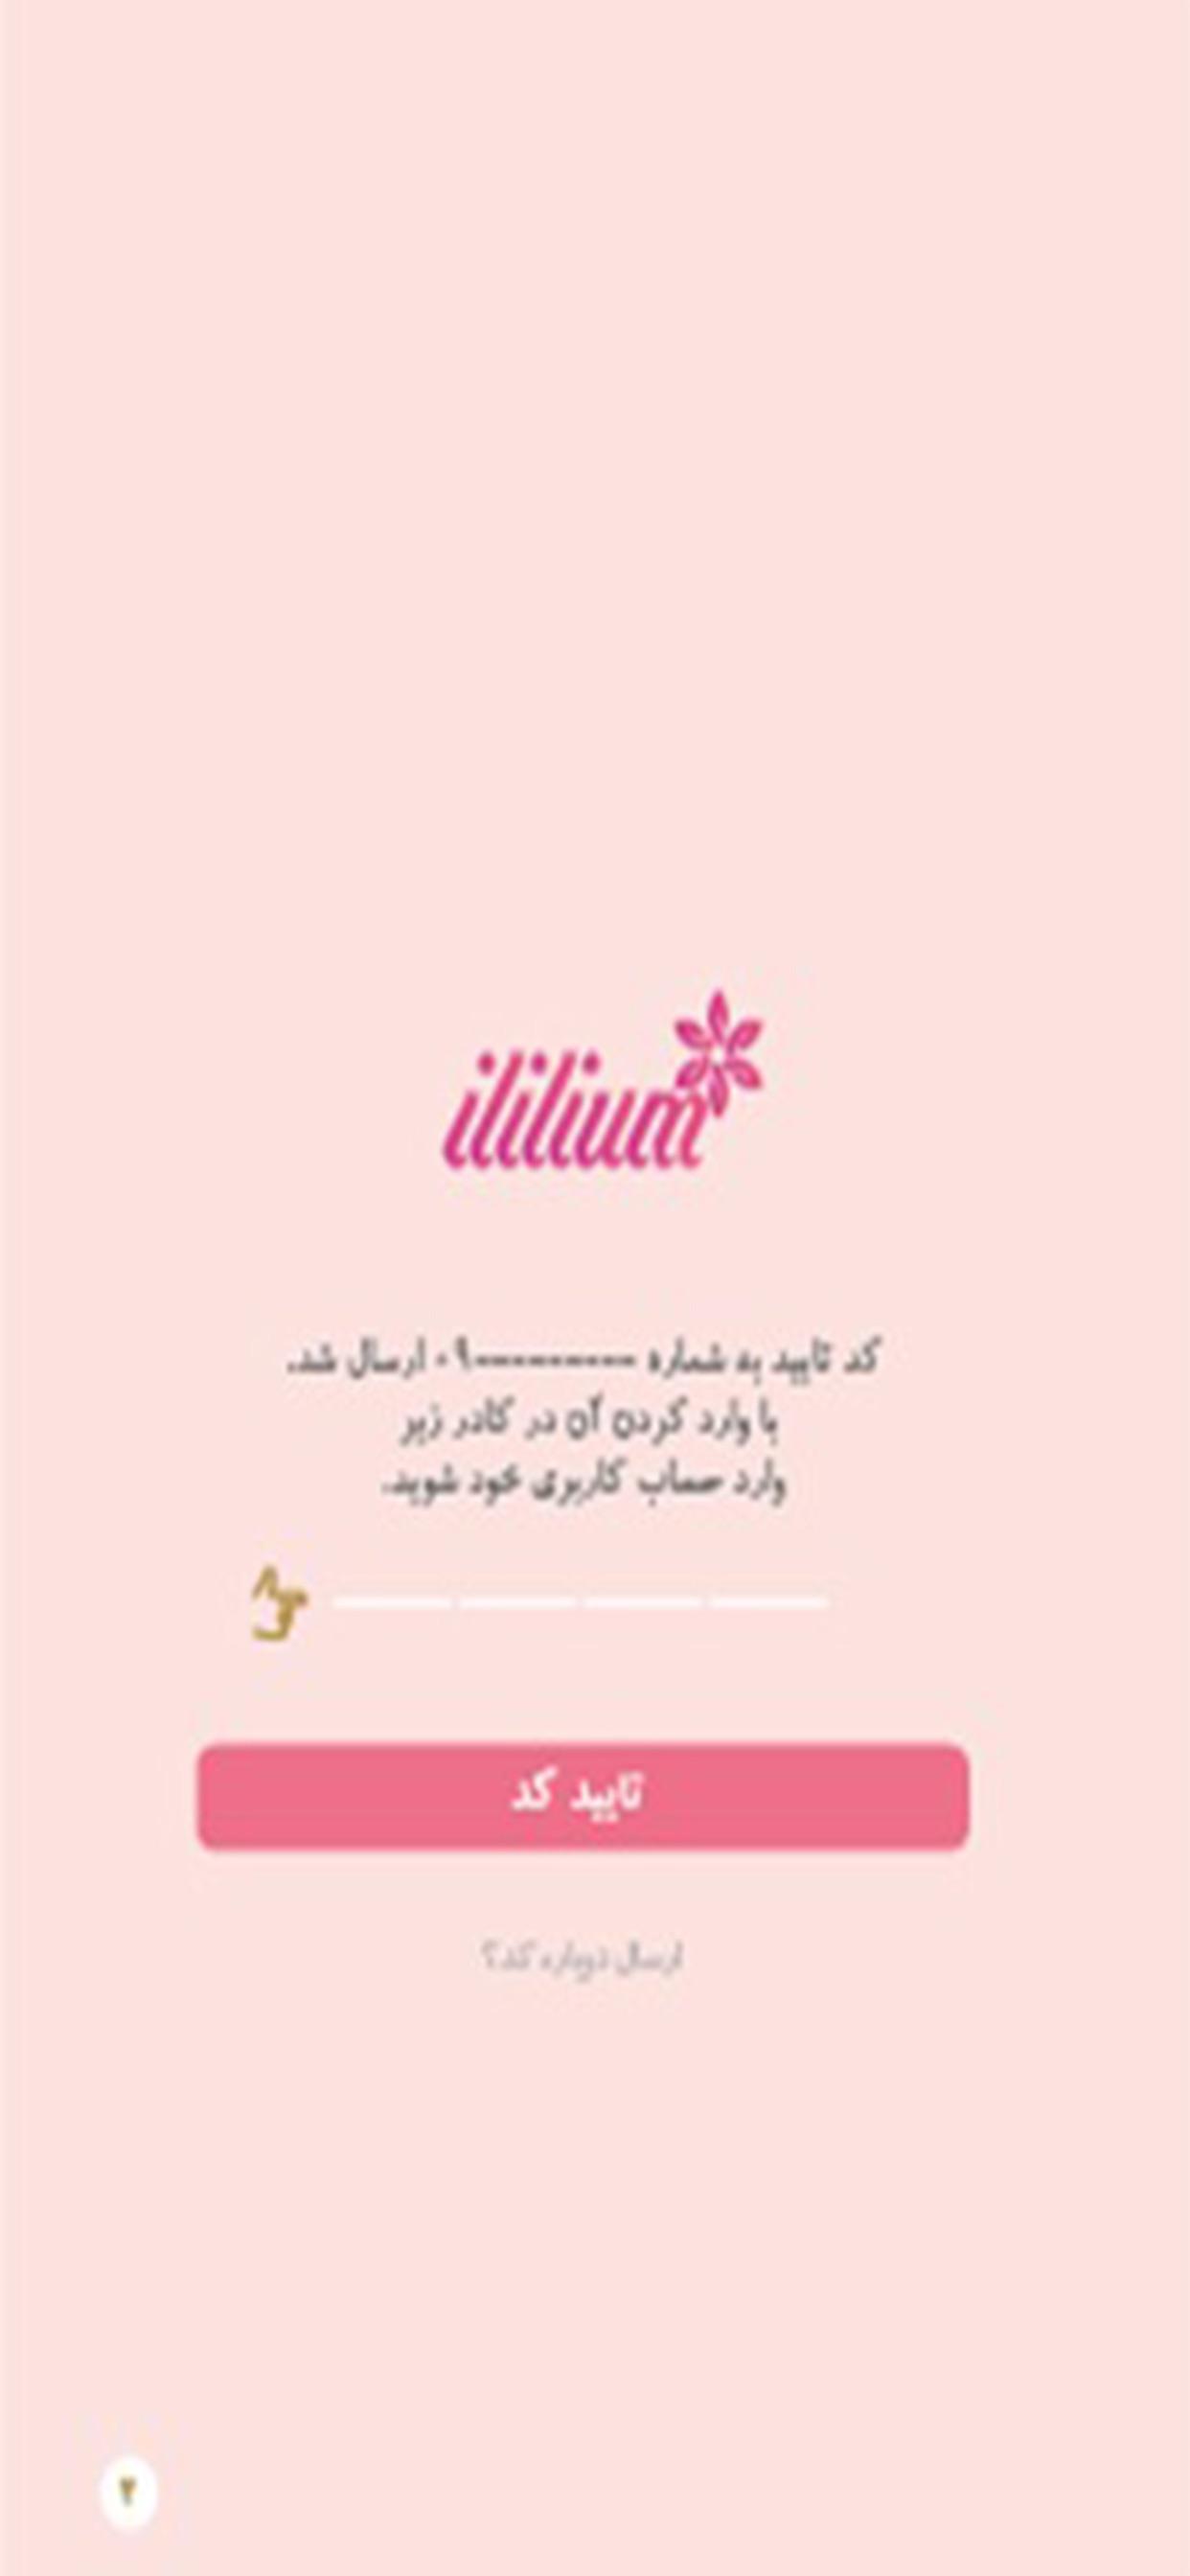 iLiLium Merchant | آی لیلیوم فروشنده